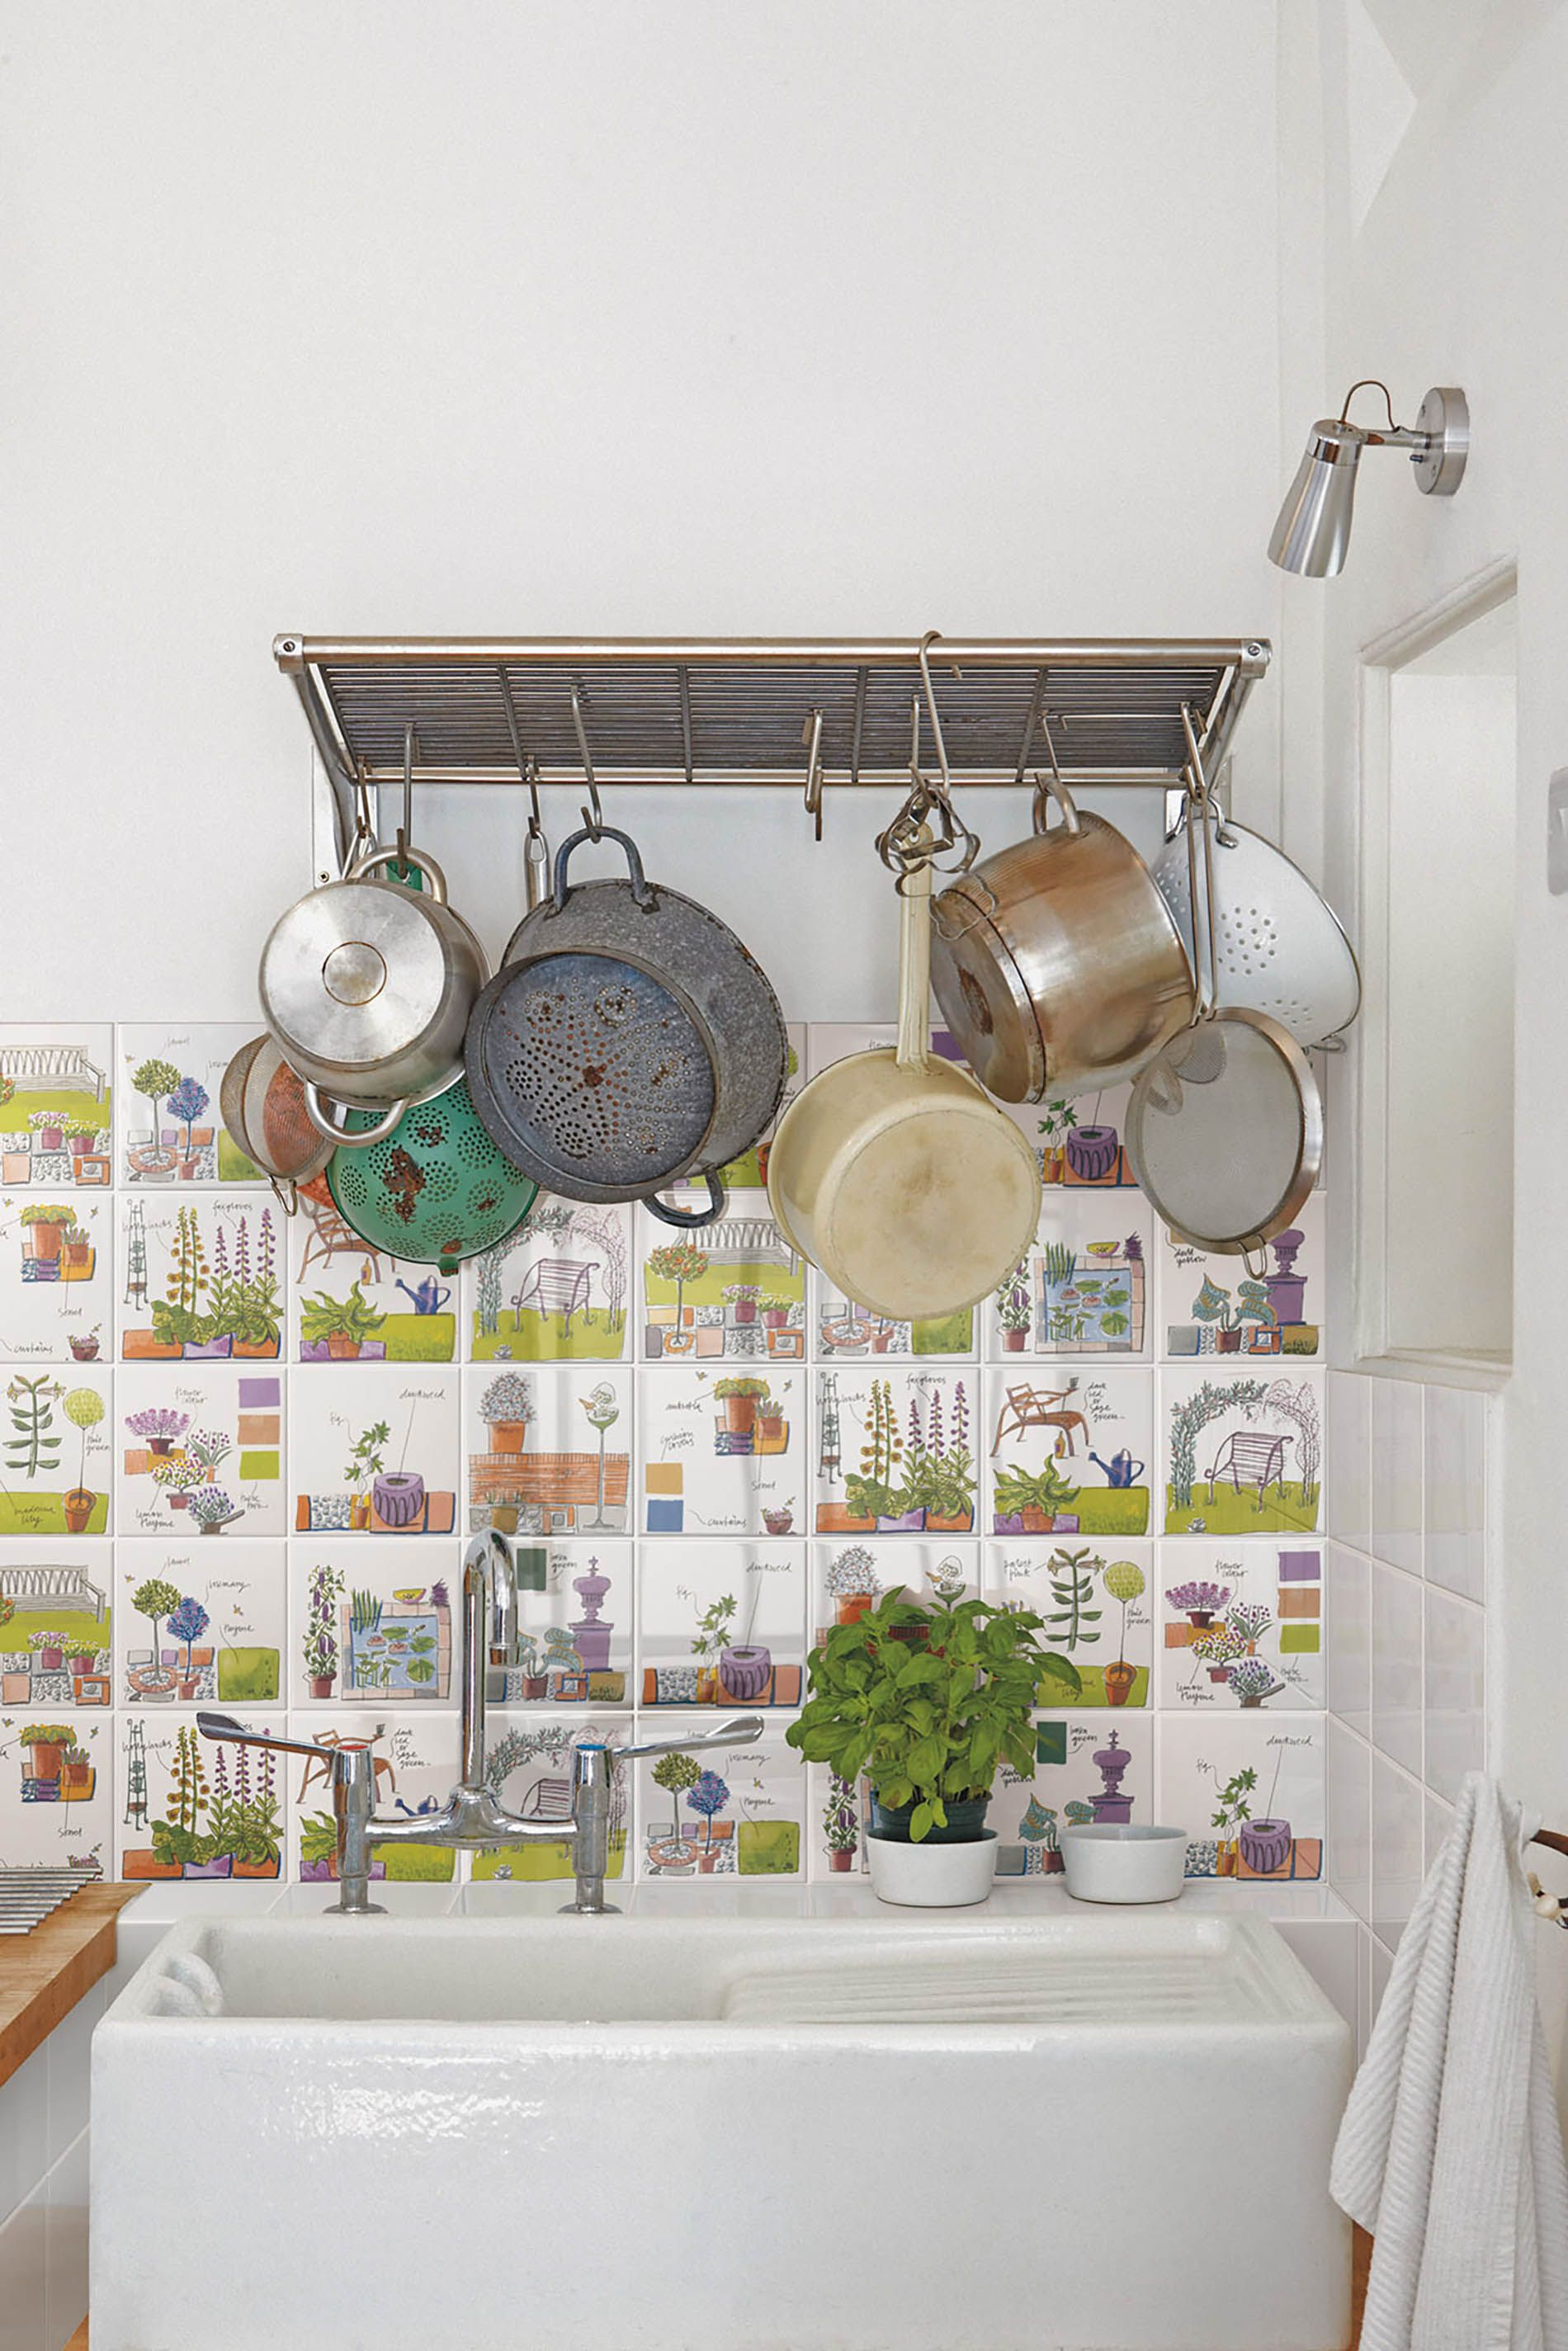 piastrelle in ceramica rivestimento bagno cucina floreale design ...